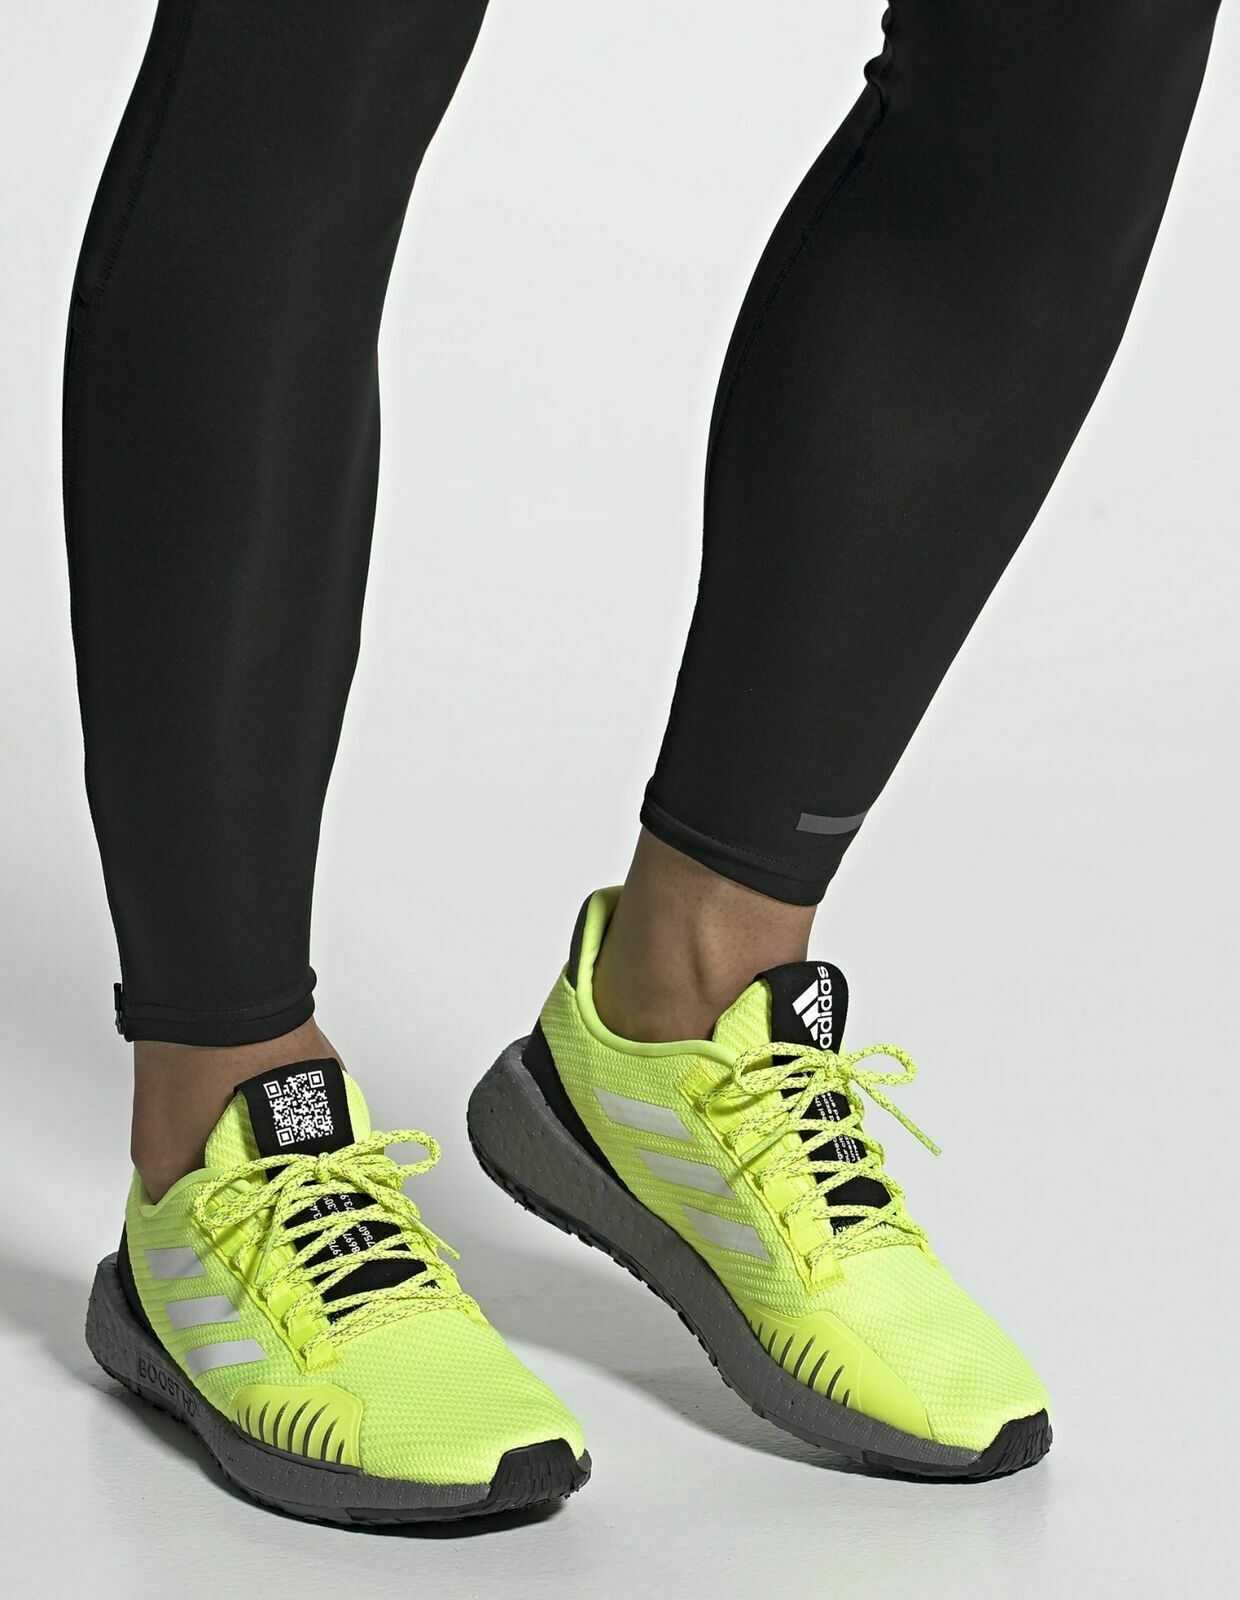 EF8906 Mens Adidas PulseBOOST HD WNTR GENUINE Running schuhe UK -8-9,5-10-11-11,5